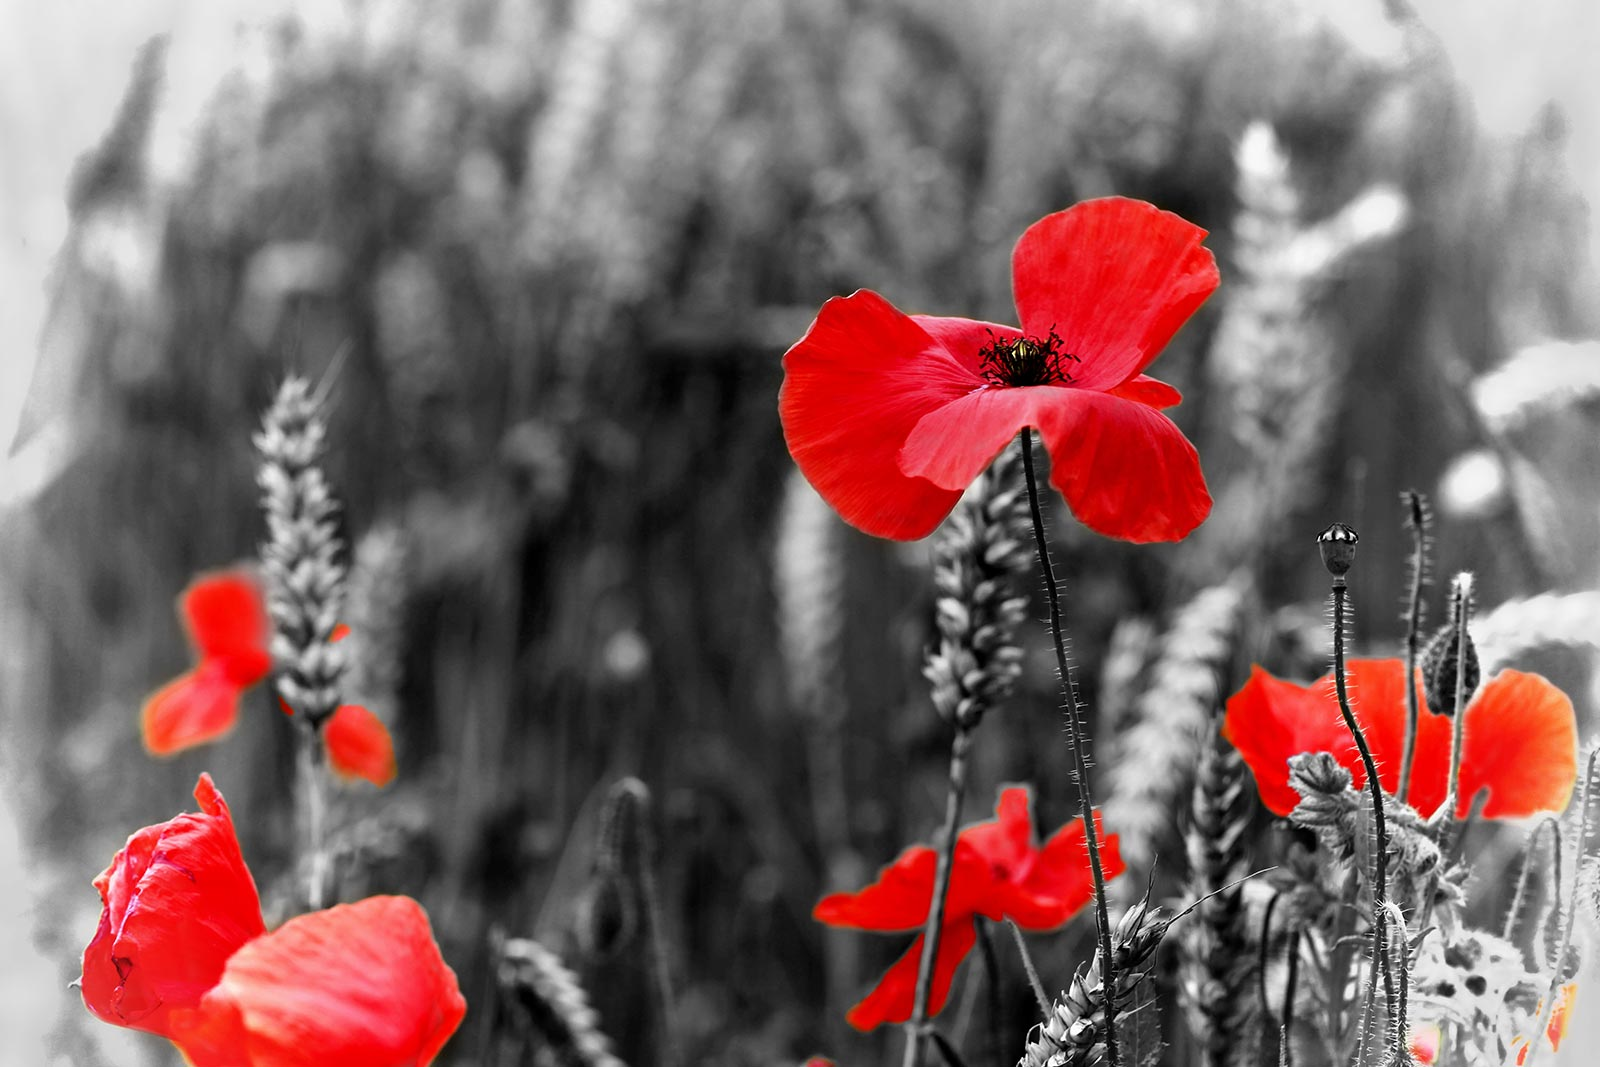 Image poppy-red-flower-symbol-war-remembrance